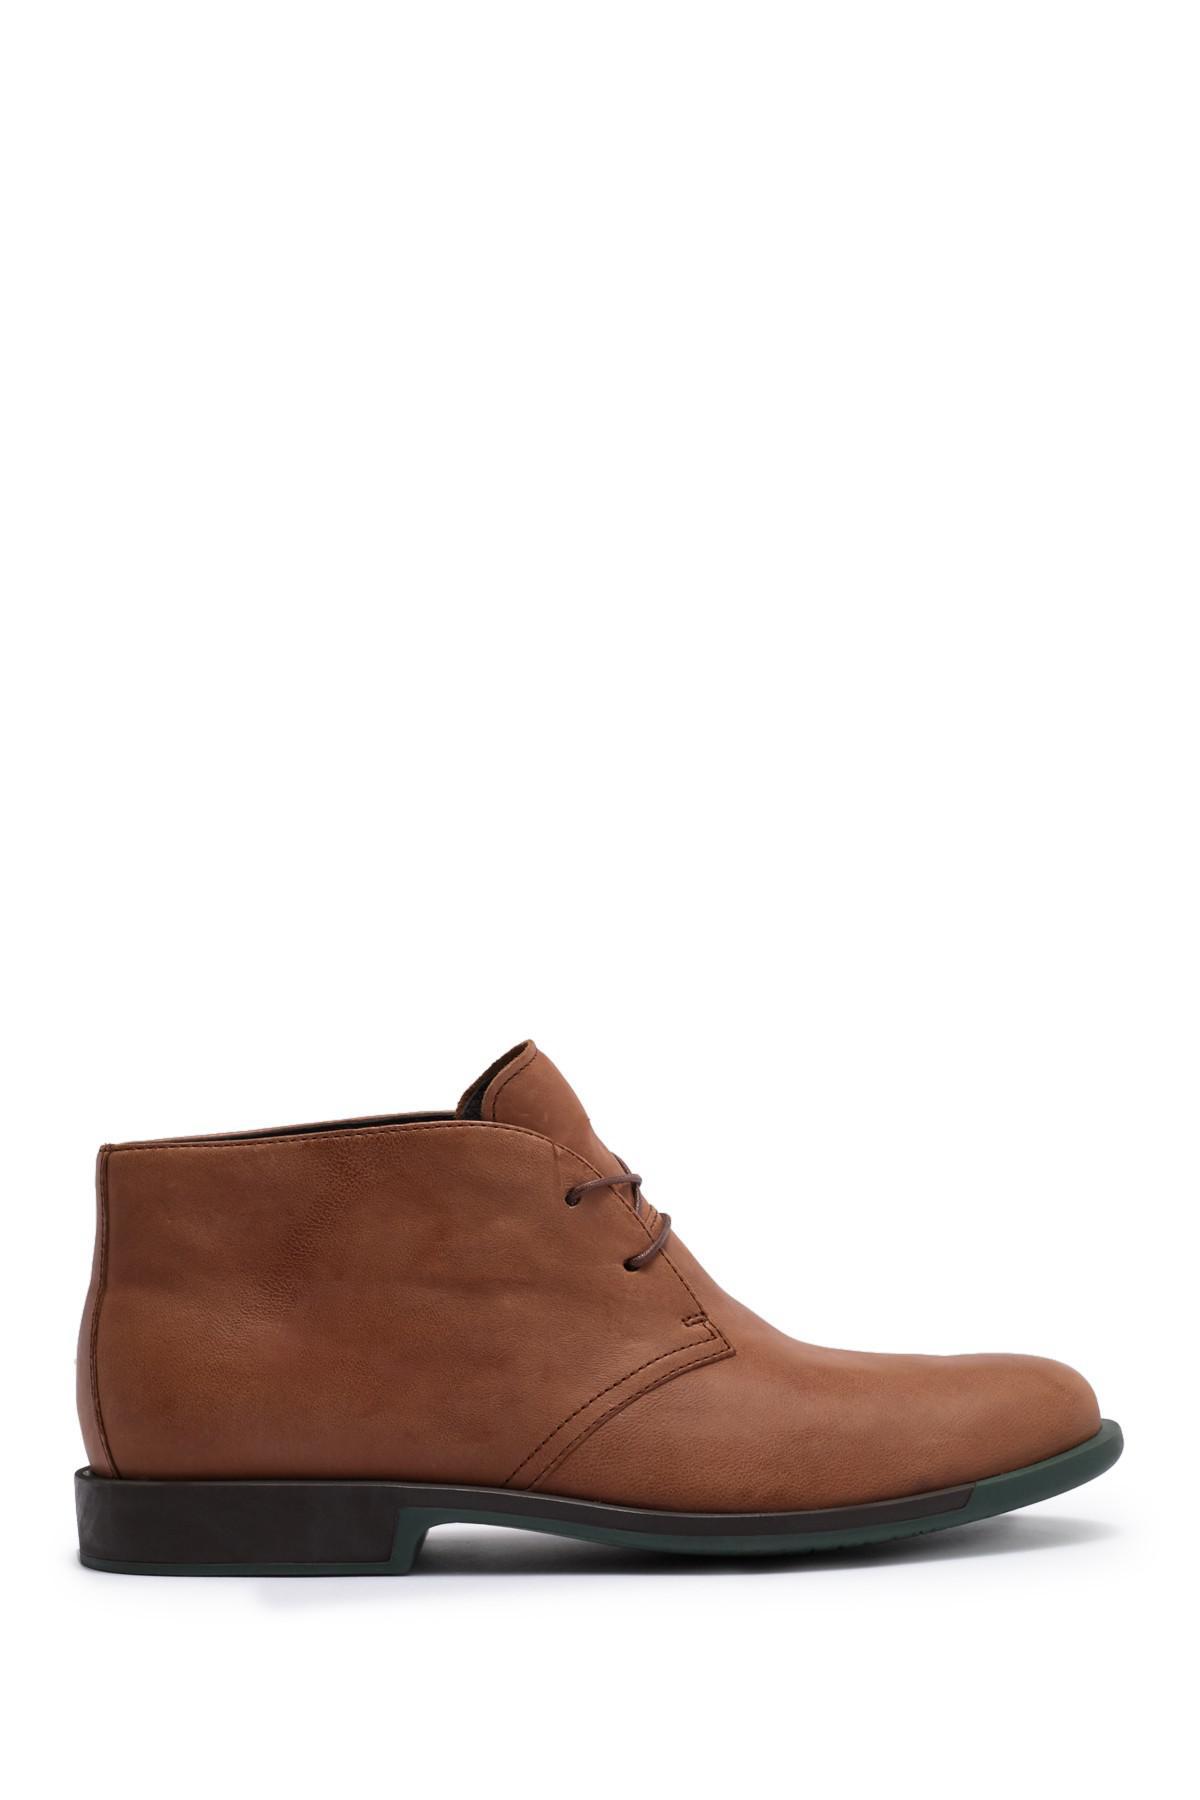 CAMPER Rebowie Leather Chukka Boot yoxIYmU1